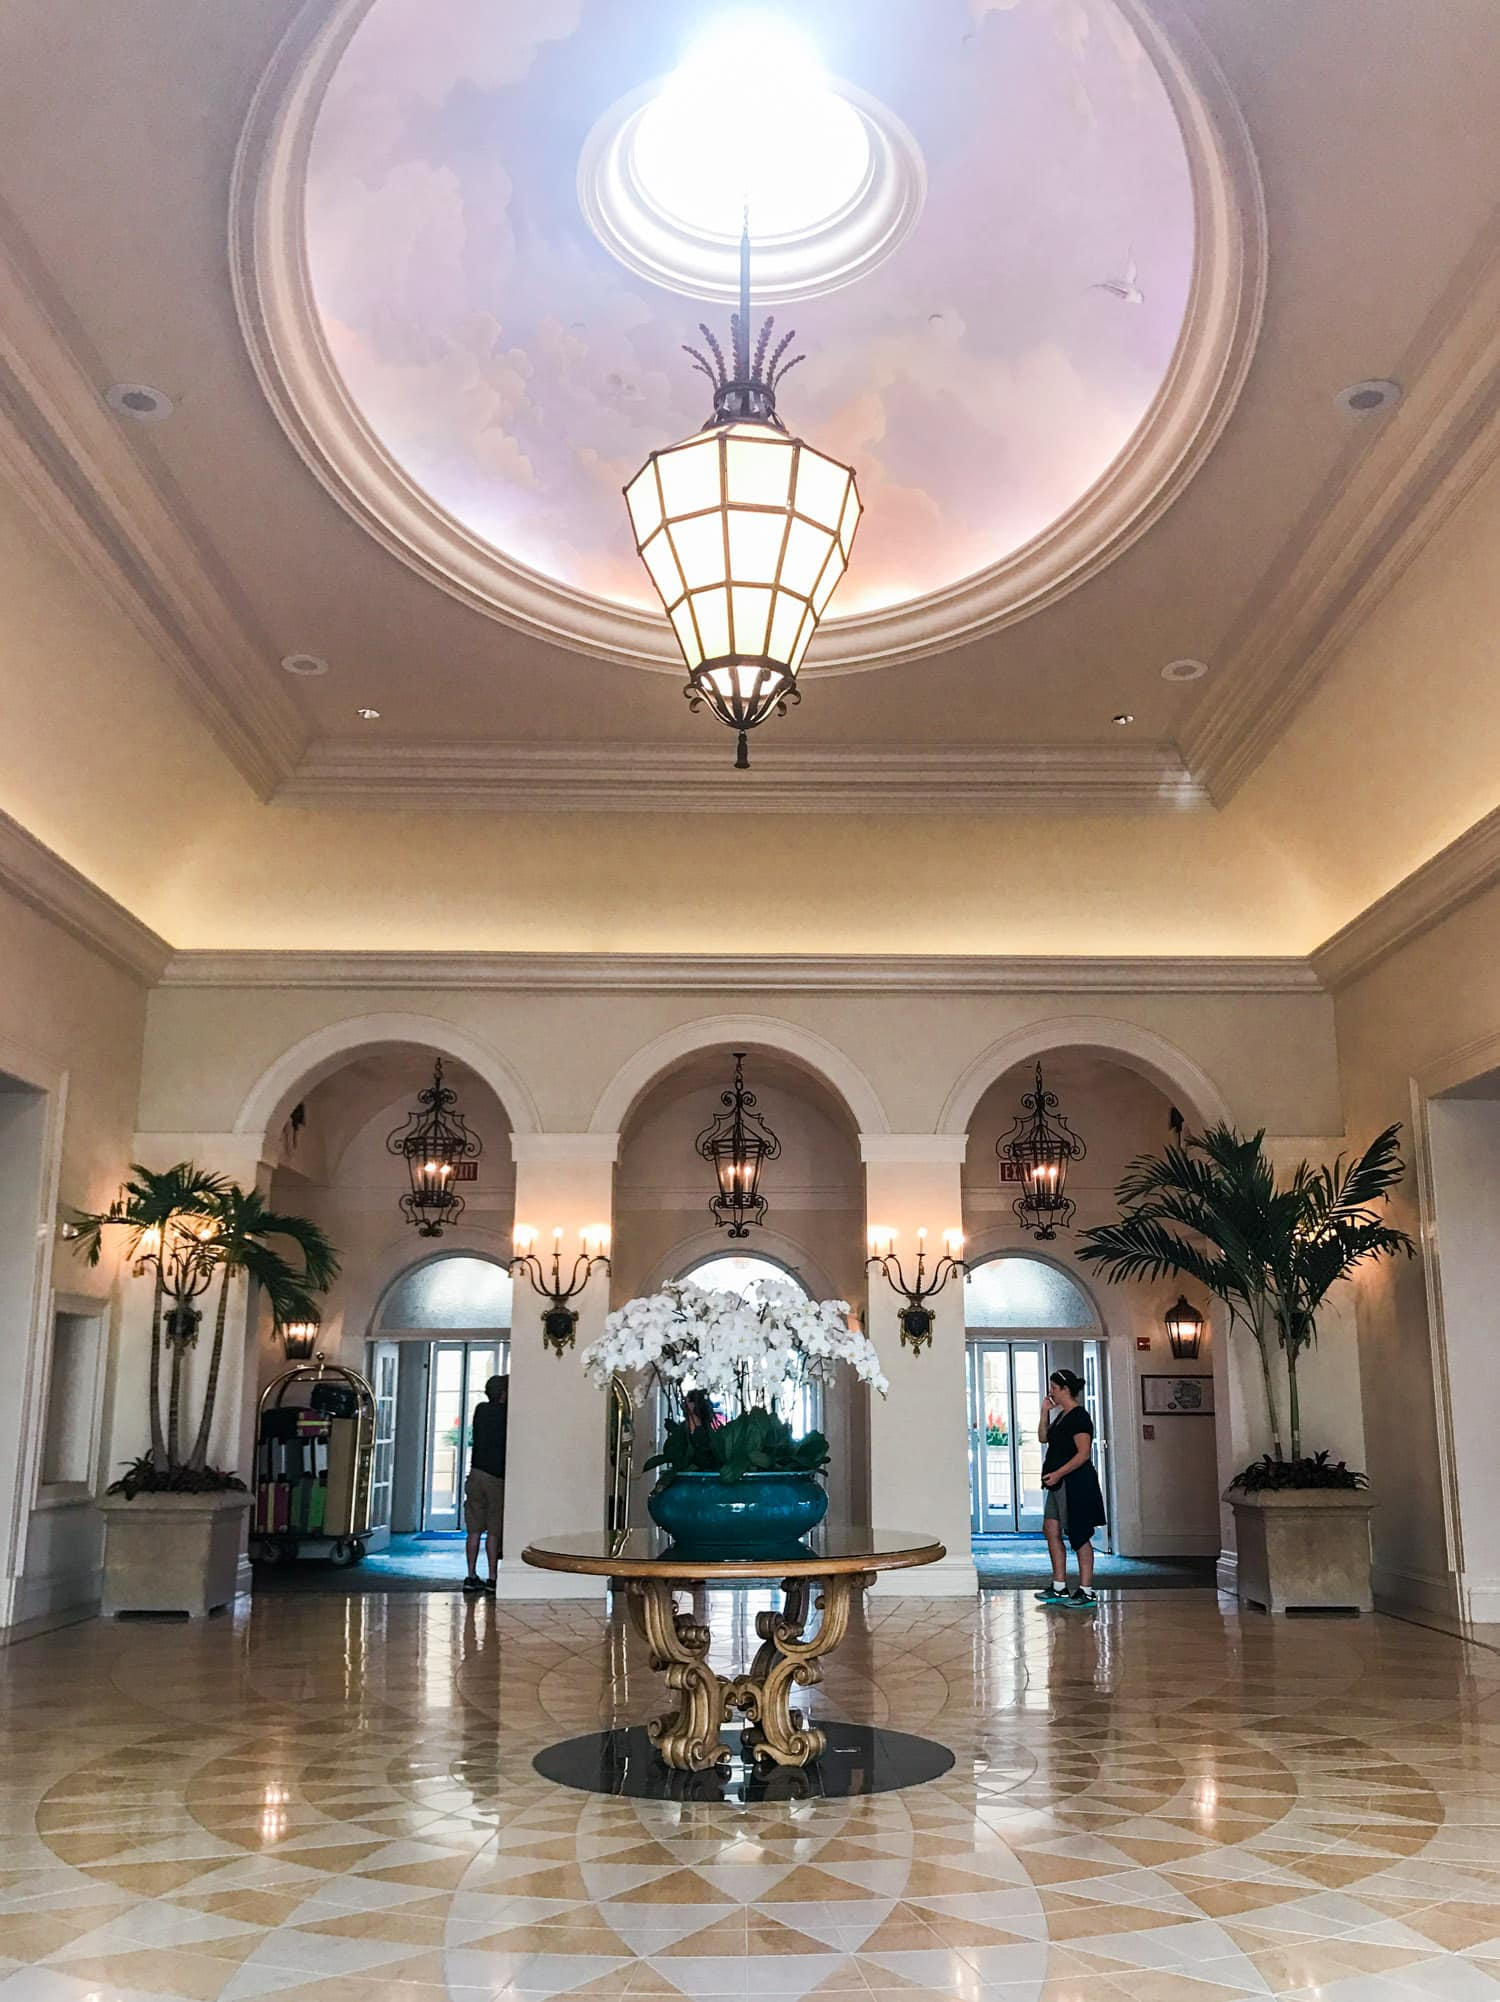 Lobby at Portofino Bay Hotel in Orlando FL